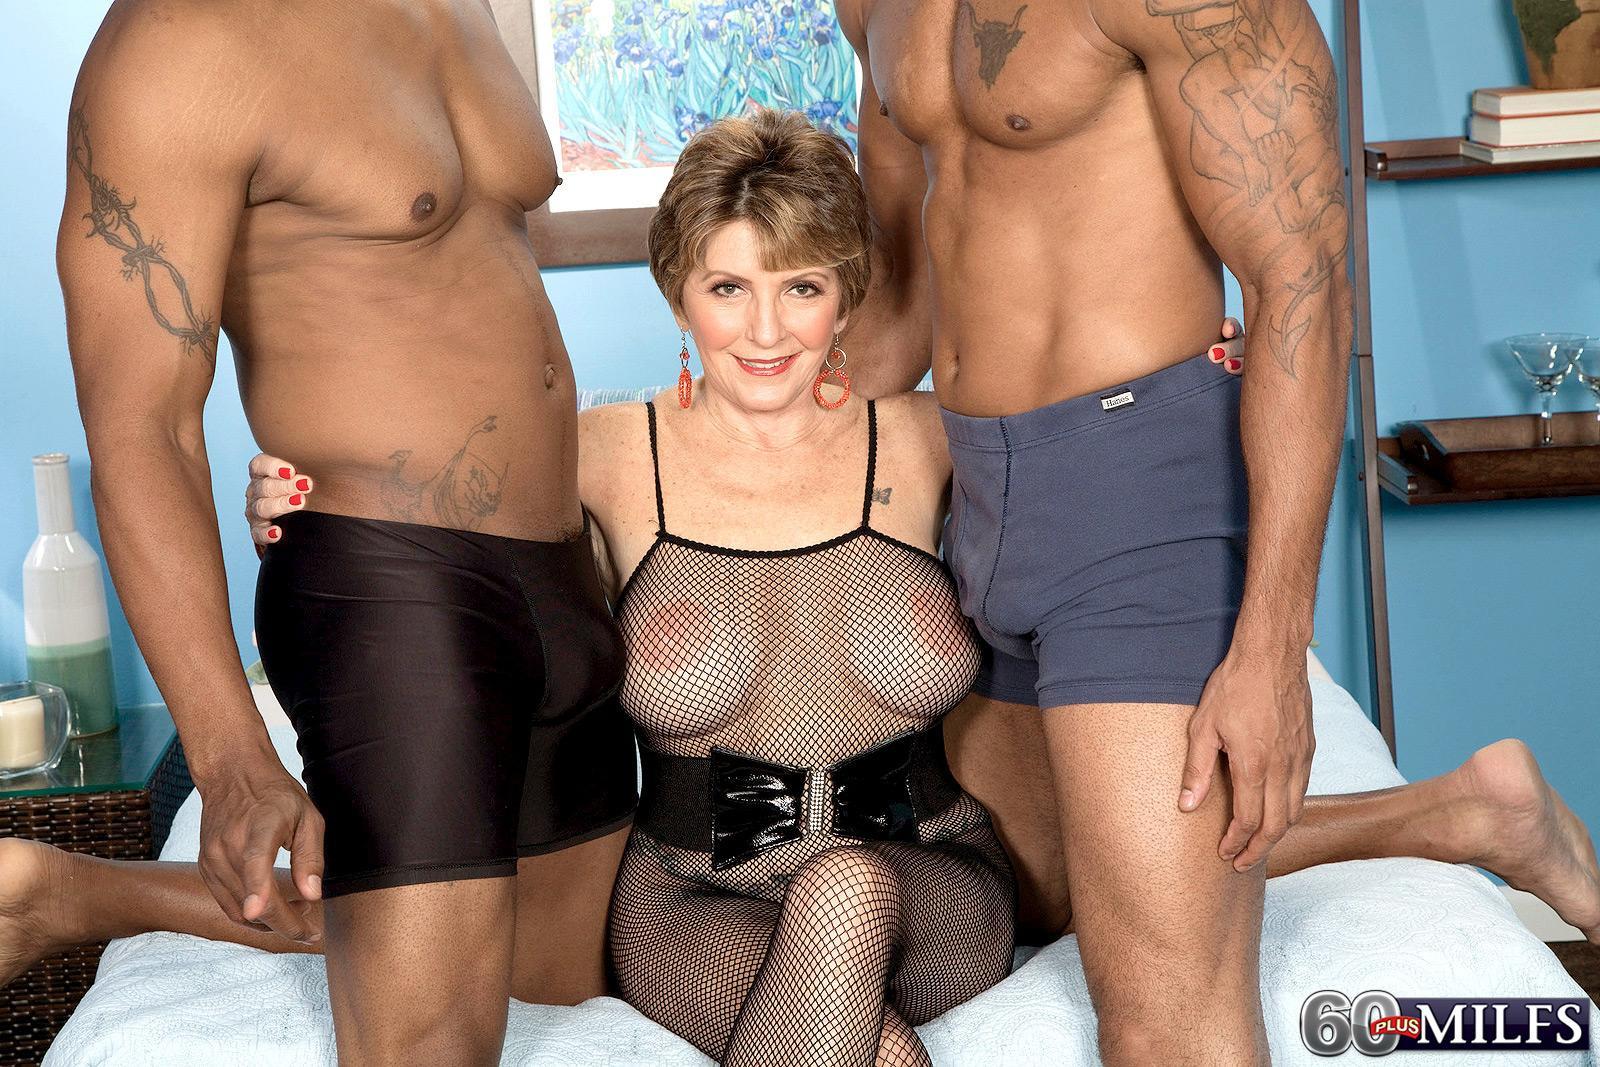 Bosomy sixty plus MILF Bea Cummins jerking big ebony dick in bi-racial threesome sex festival